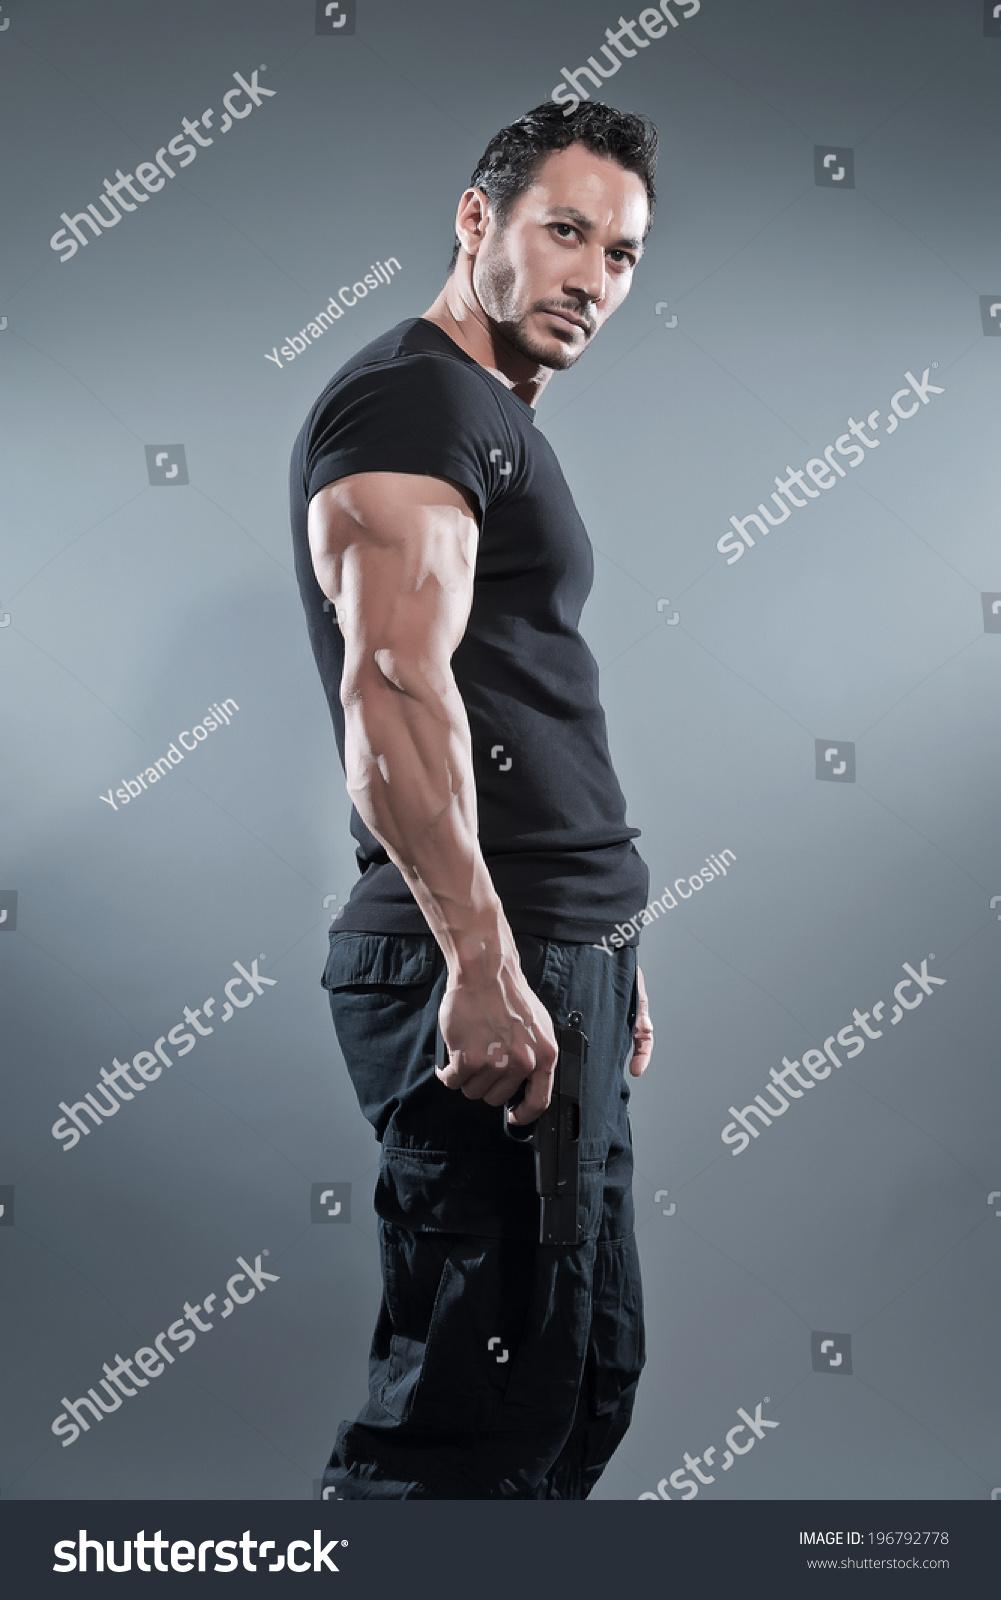 Black t shirt navy pants - Black T Shirt Grey Pants Action Hero Muscled Man Holding A Gun Wearing Black T